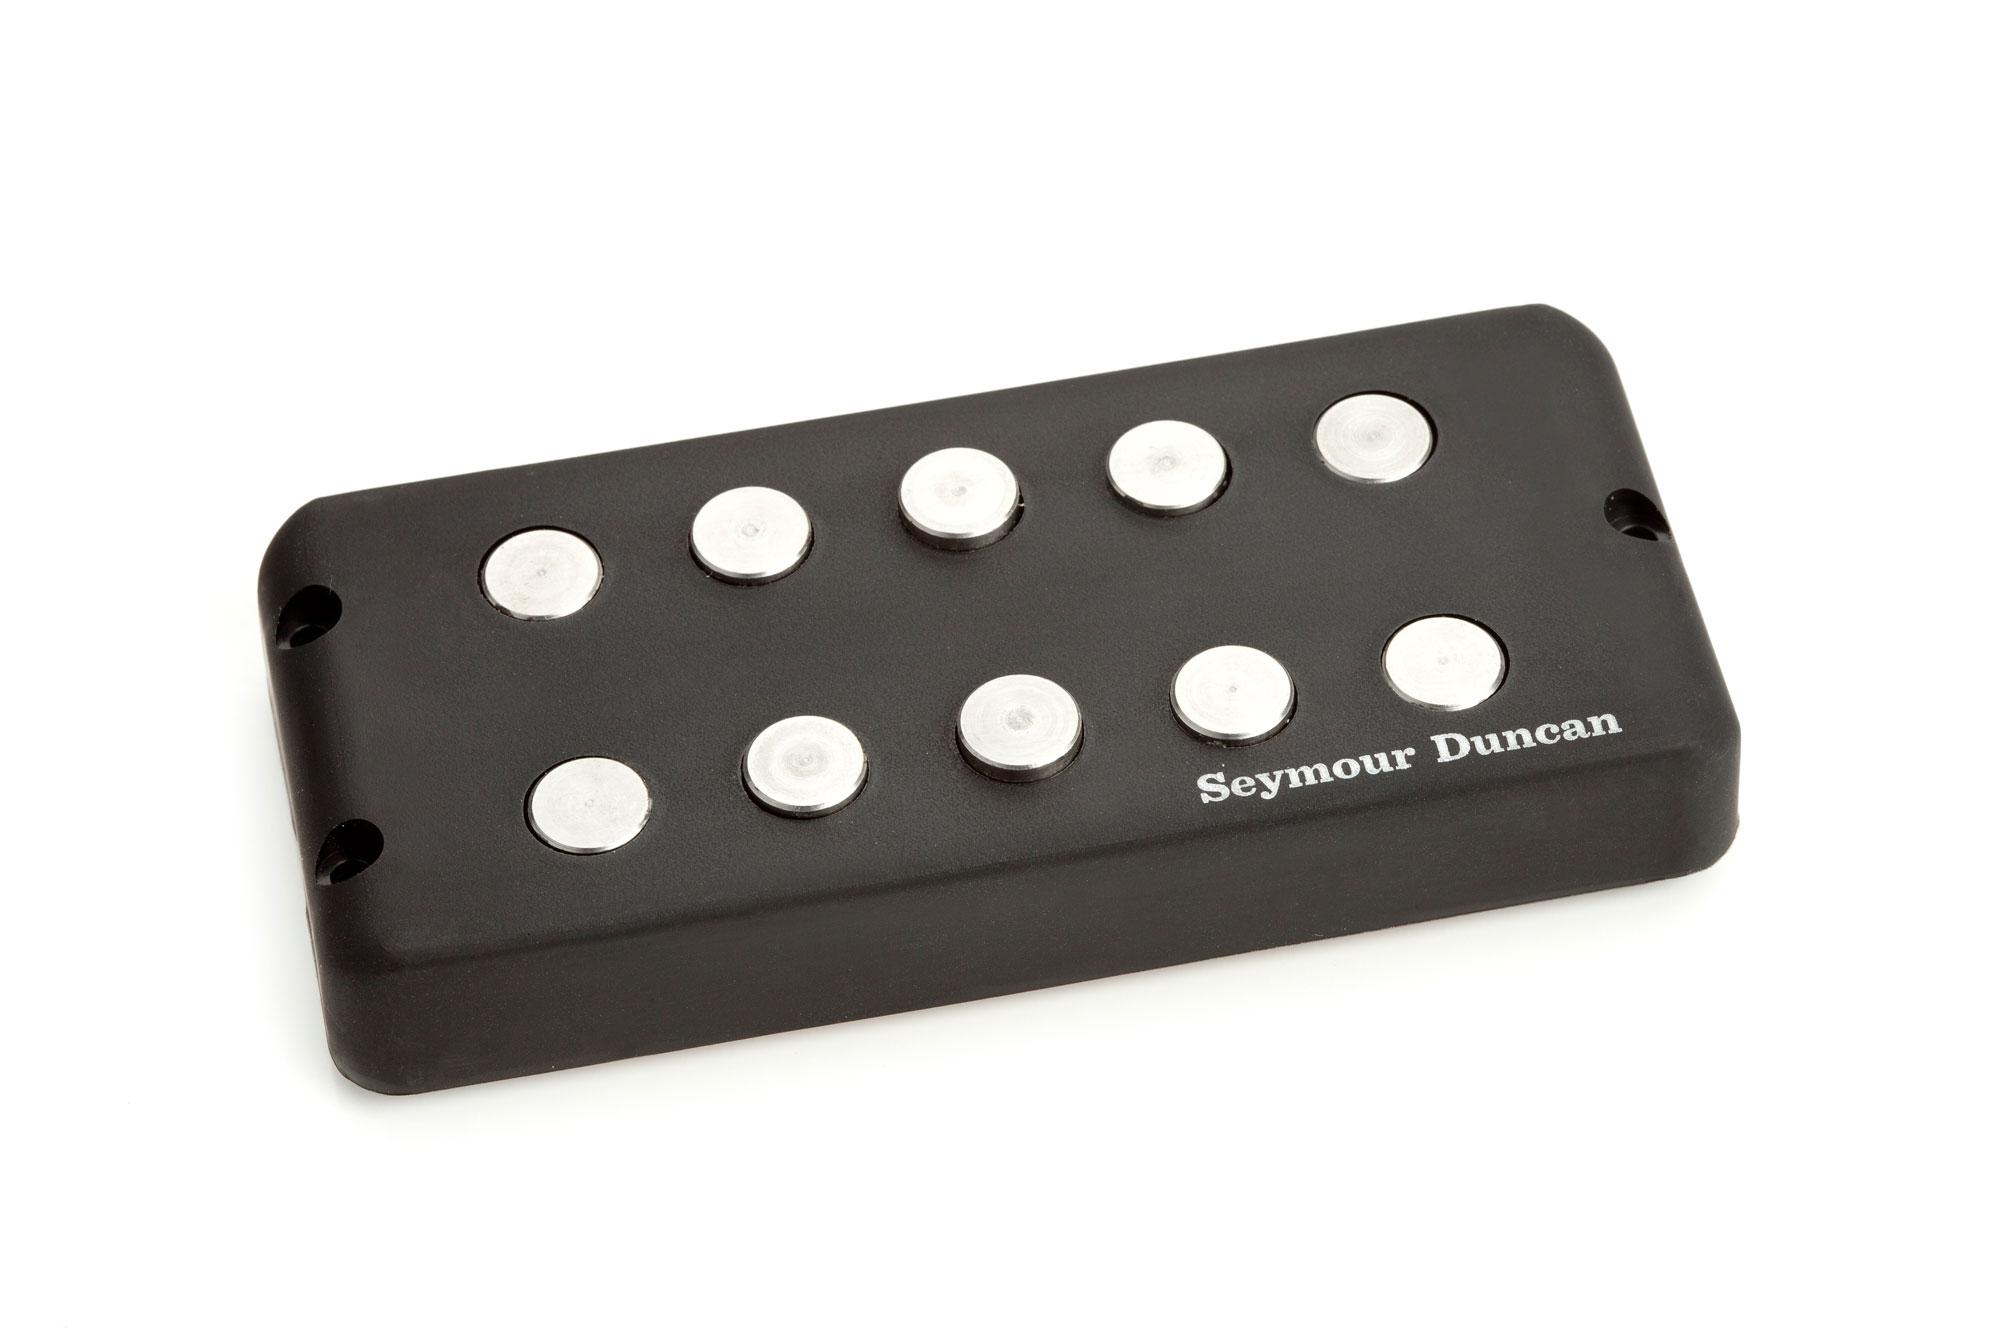 seymour duncan smb 5d ceramic music man pickup best bass. Black Bedroom Furniture Sets. Home Design Ideas